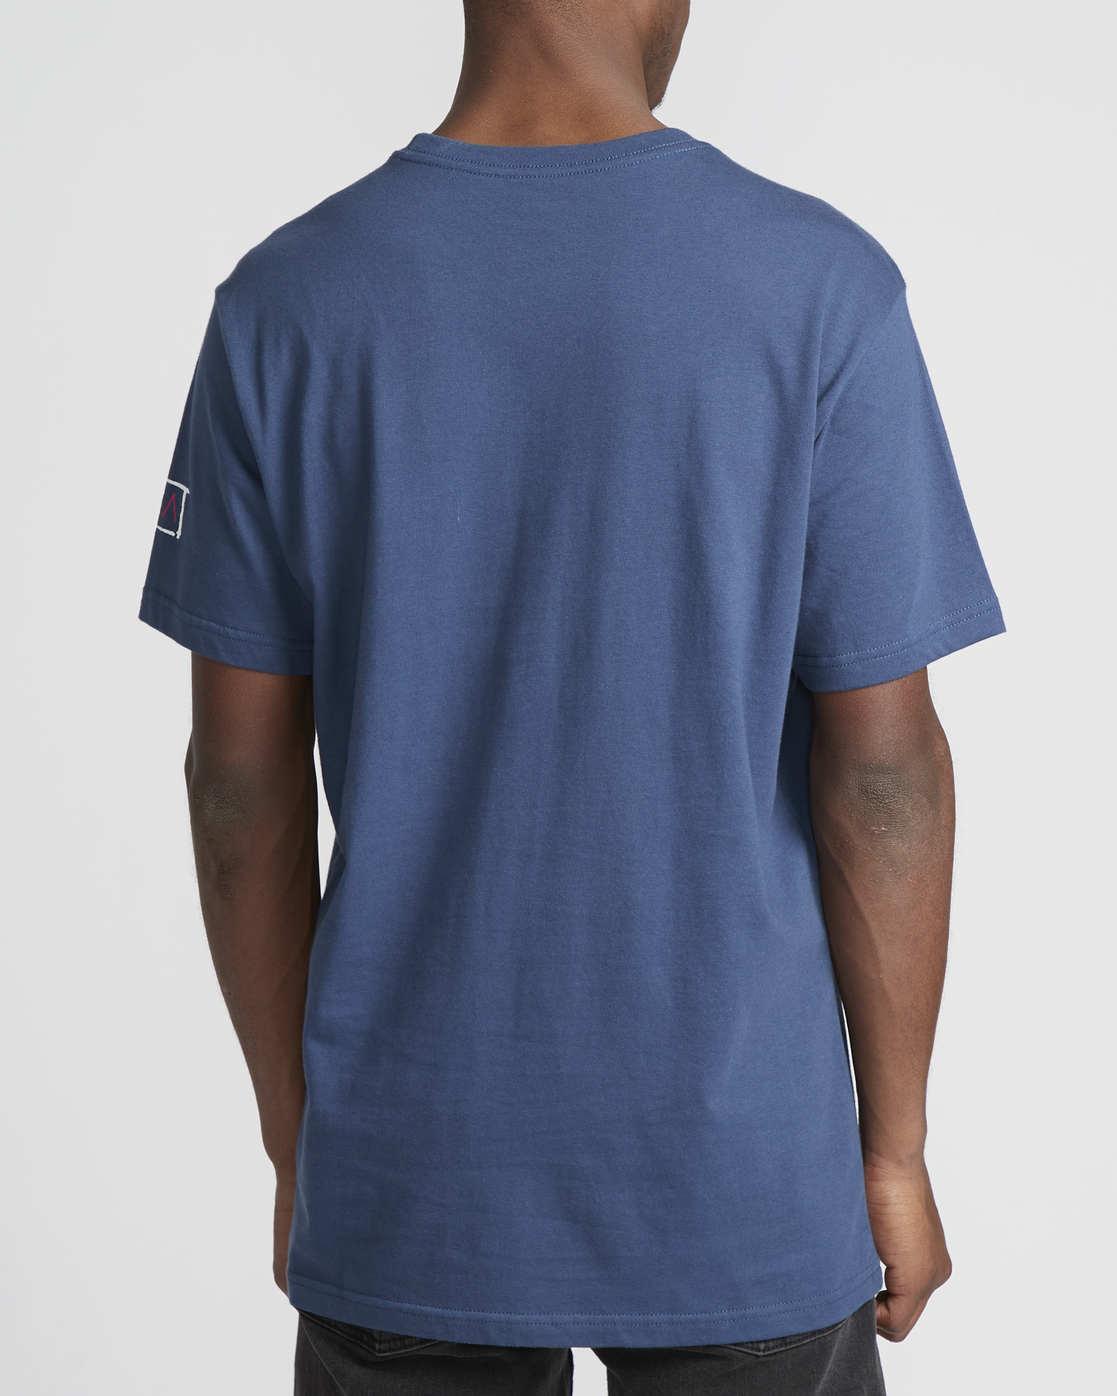 4 RVCA Blocker  - Short Sleeve T-Shirt Blue Q1SSSARVF9 RVCA